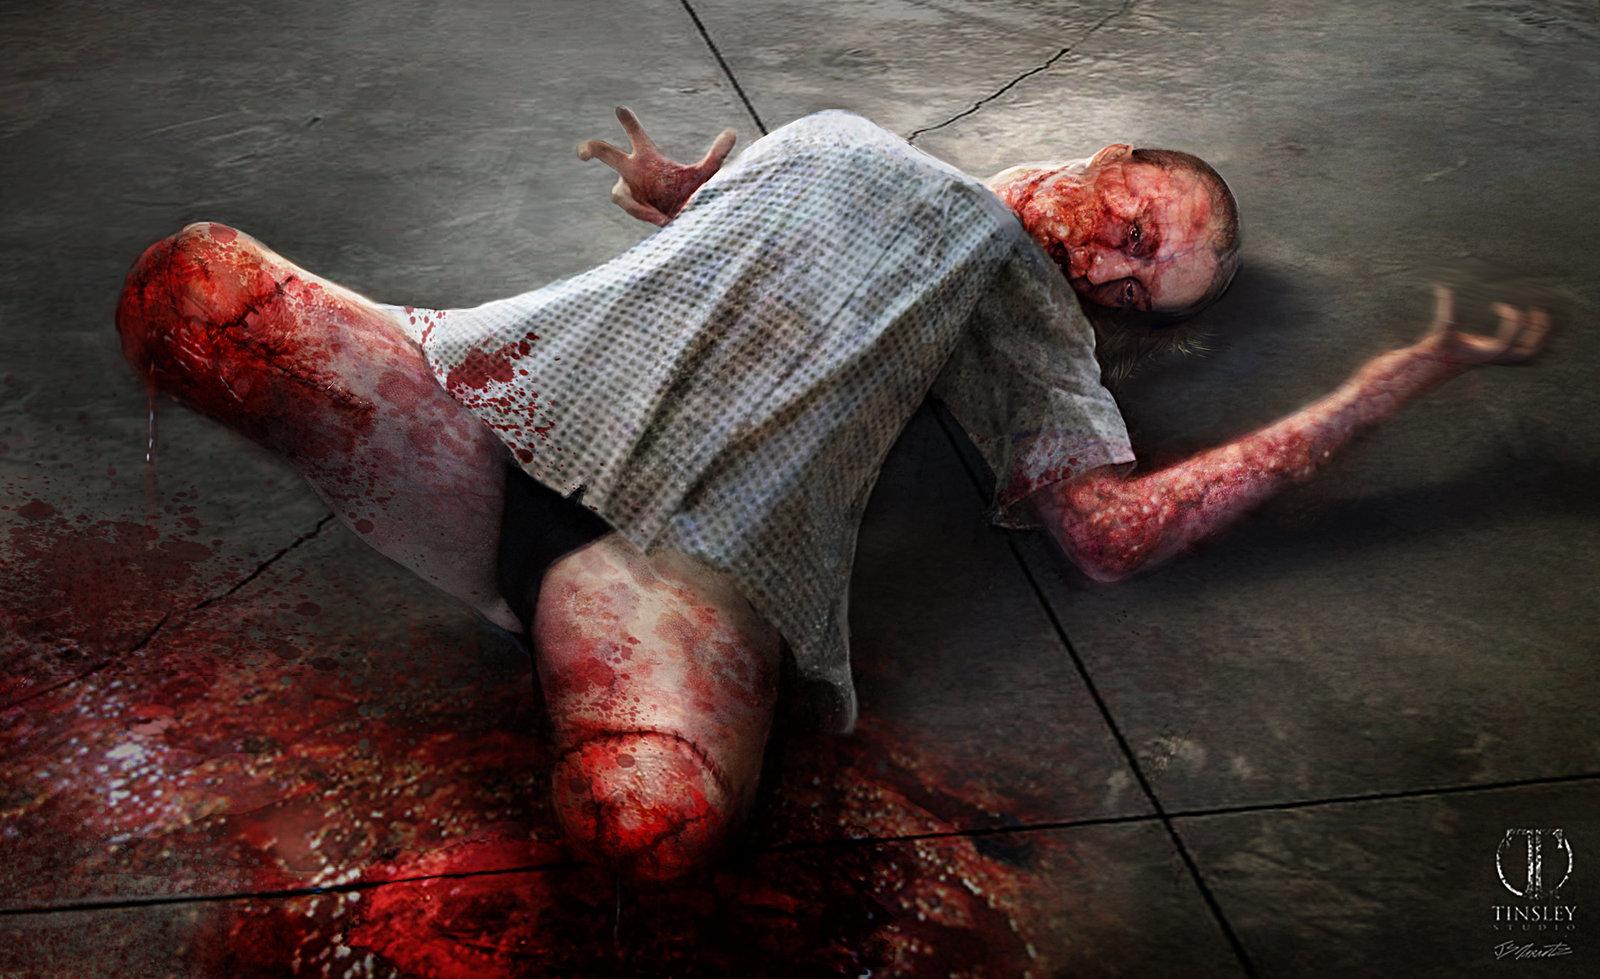 American Horror Story Asylum Chloe Rasper